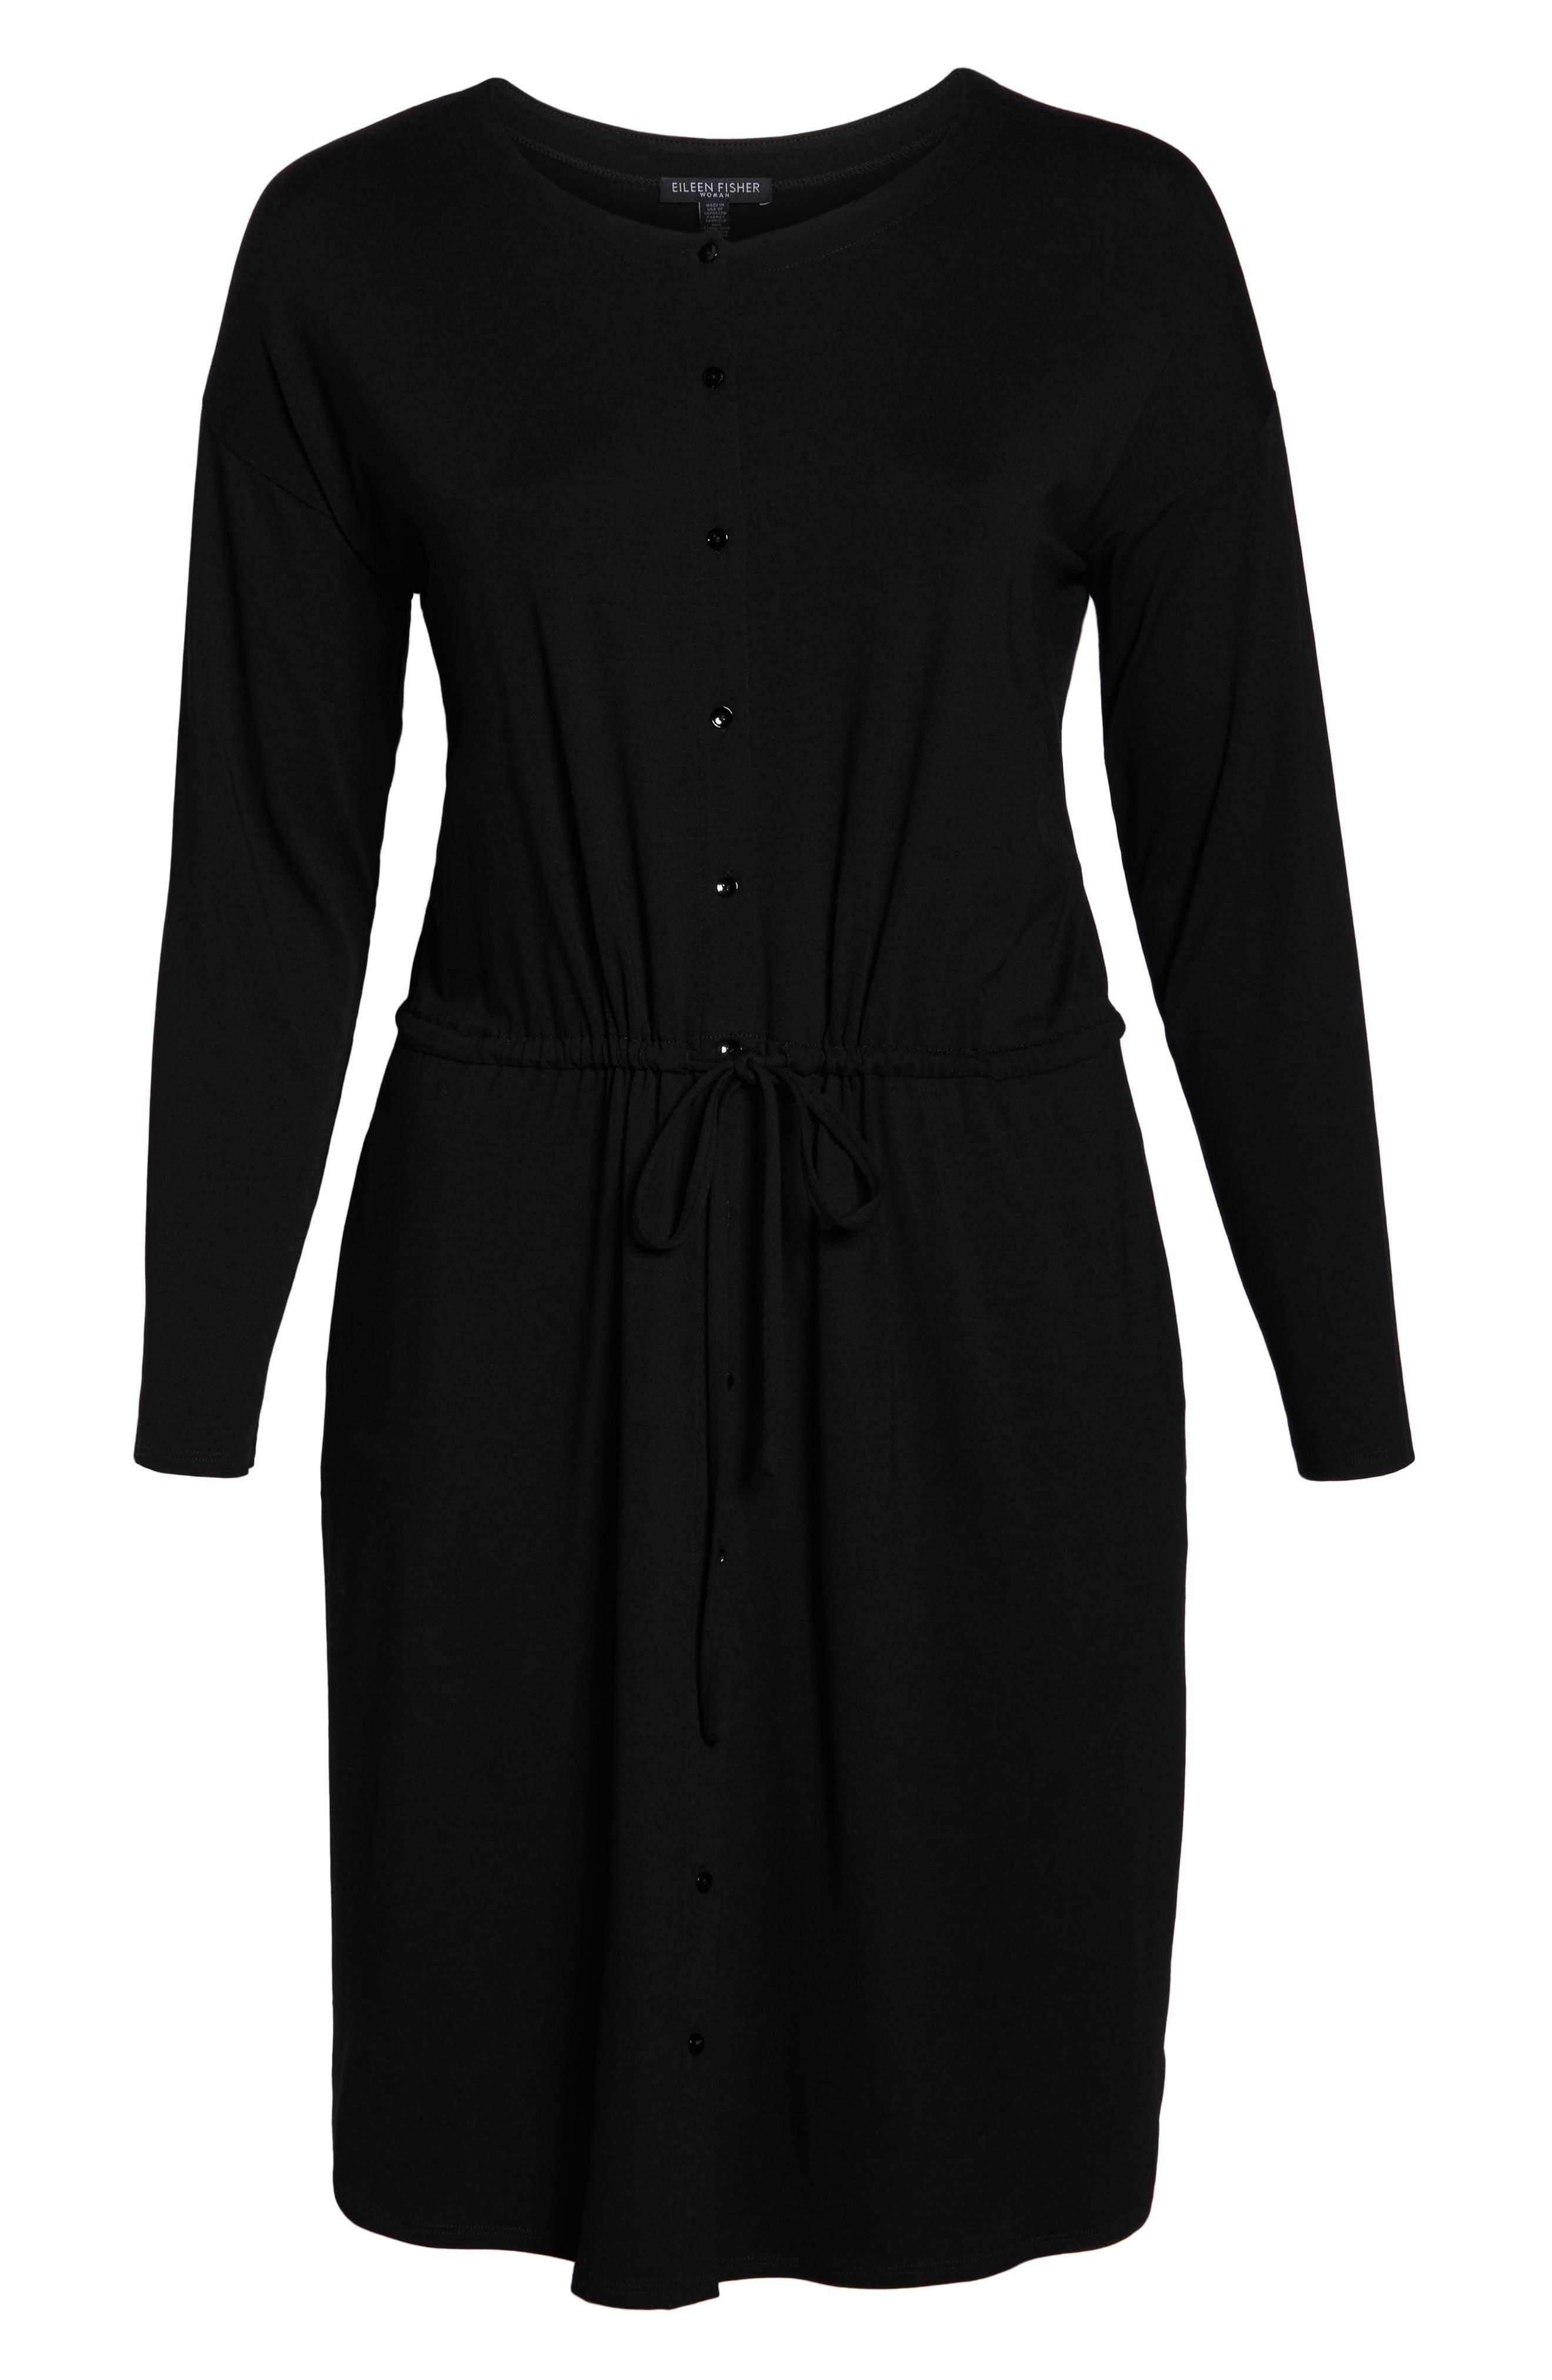 Drawstring Waist Dress,                             Alternate thumbnail 10, color,                             BLACK